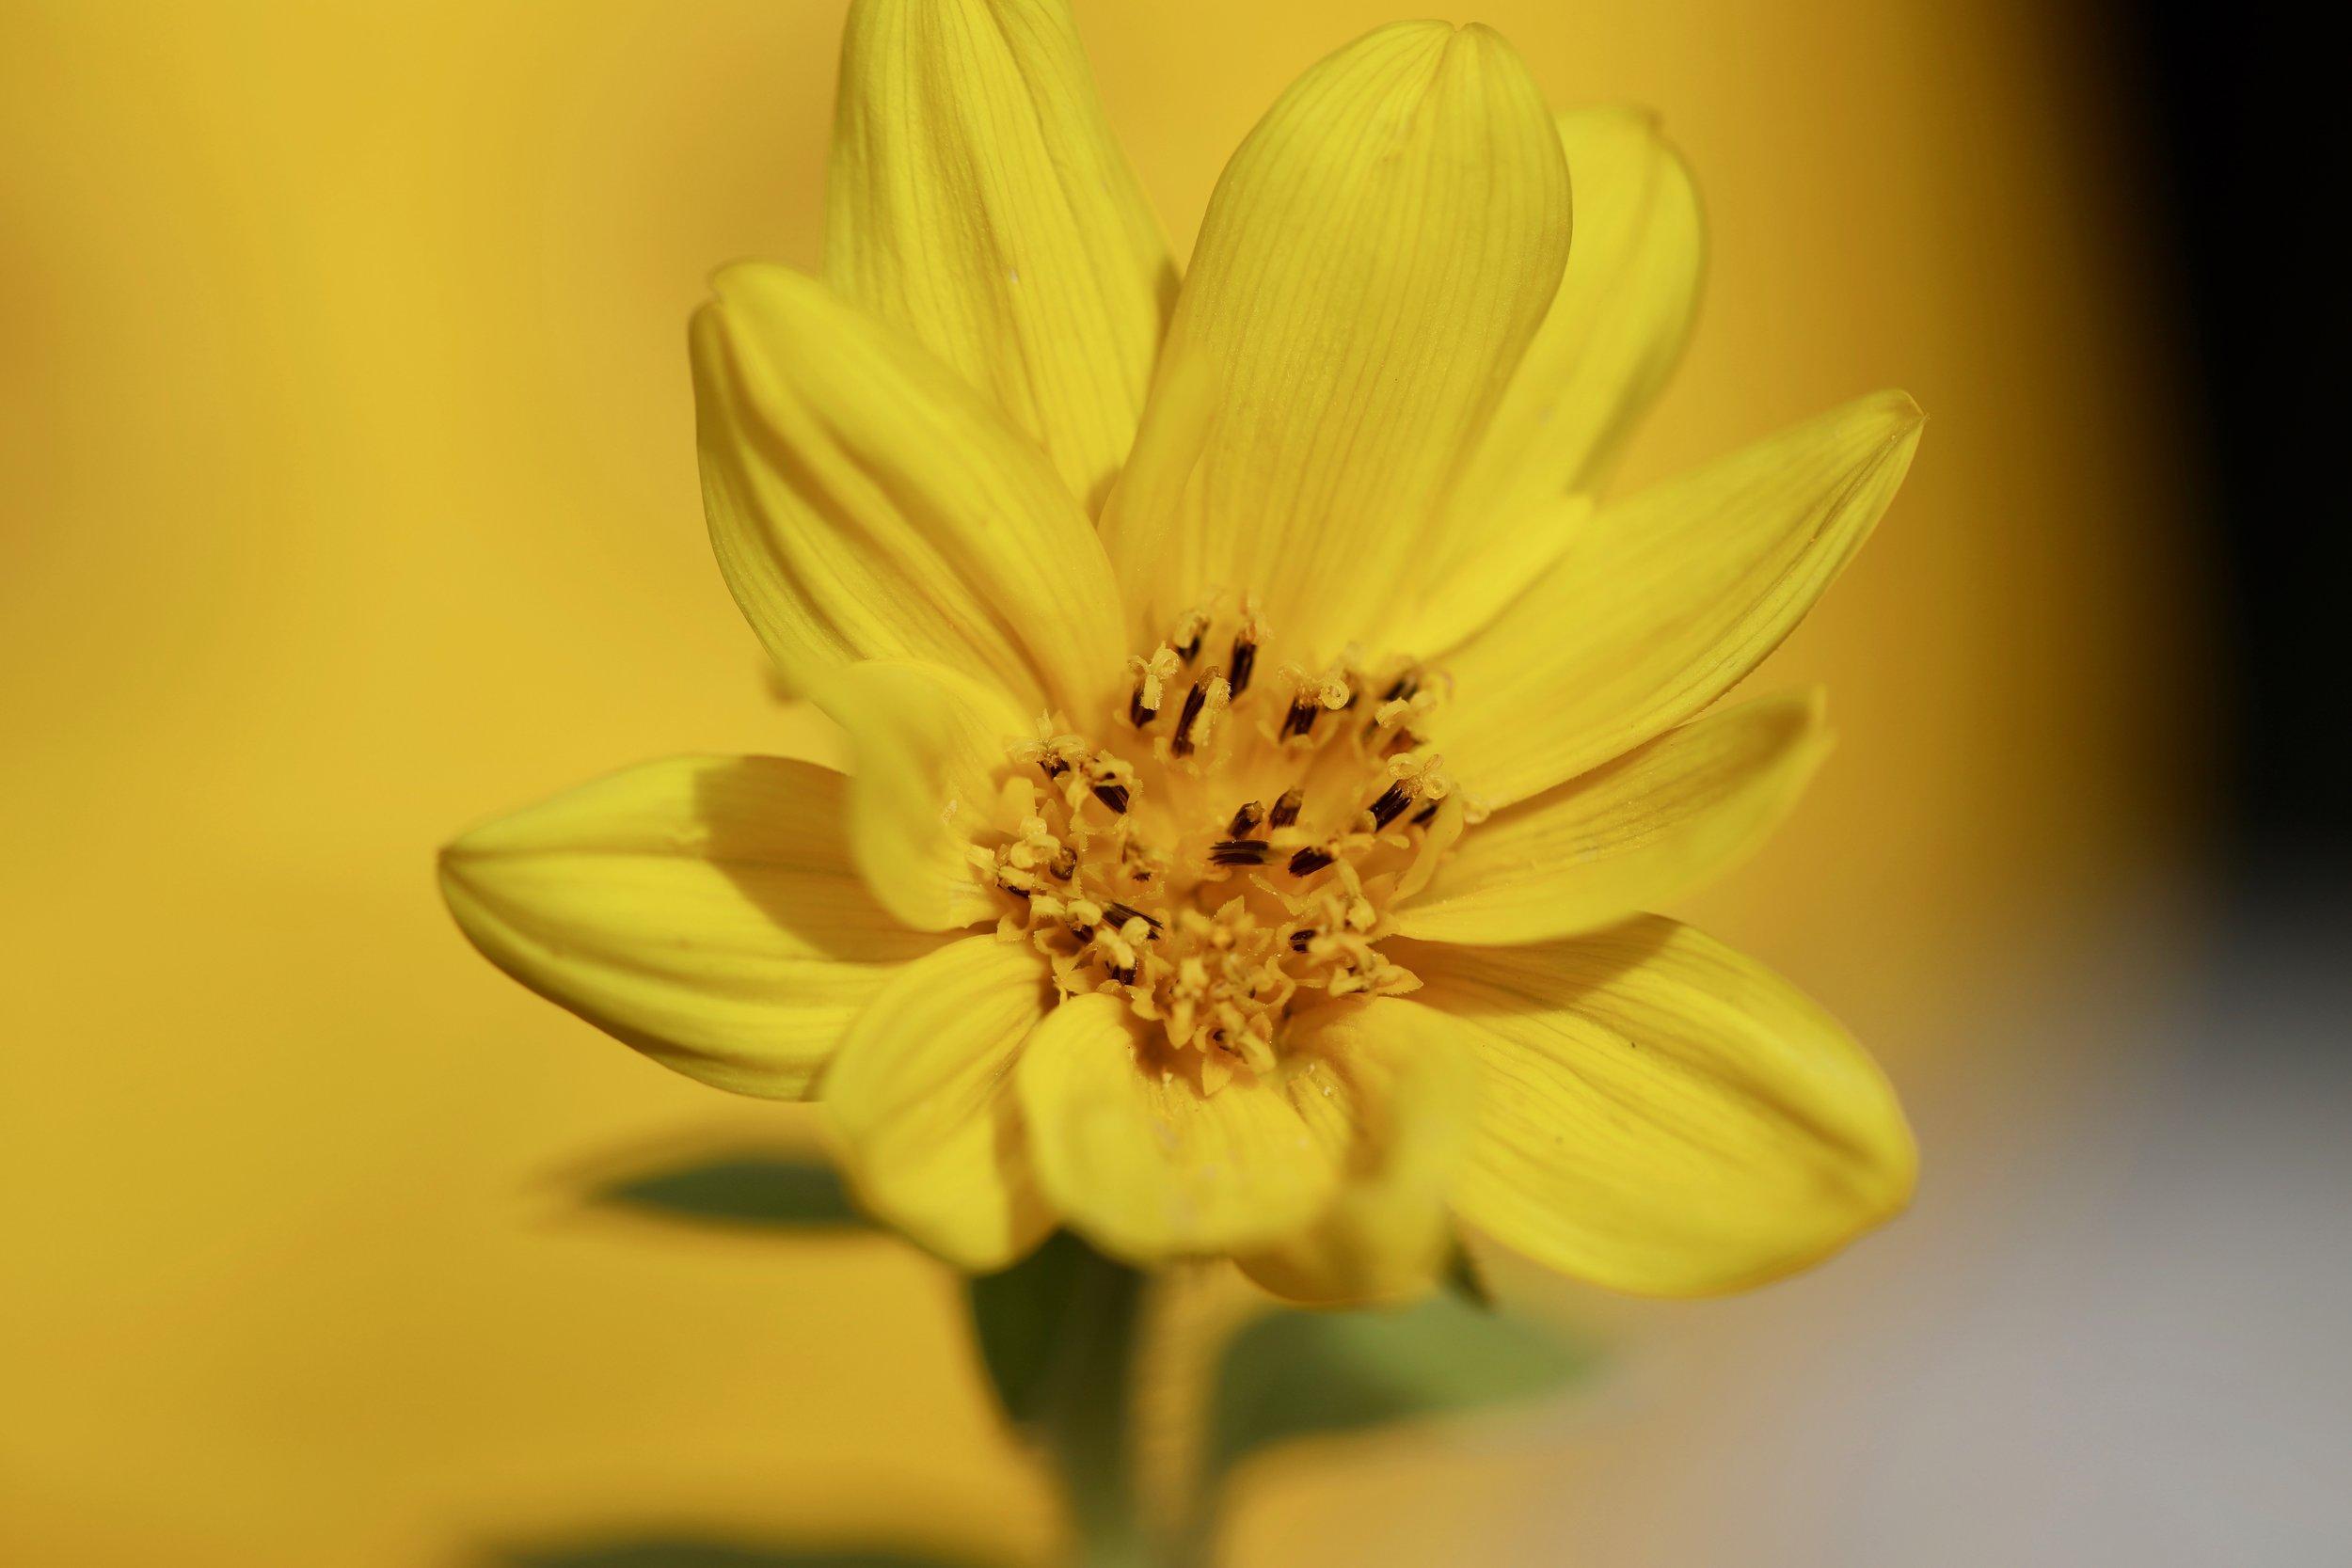 Waabigwan is the word for Flower in Anishinaabemowin.